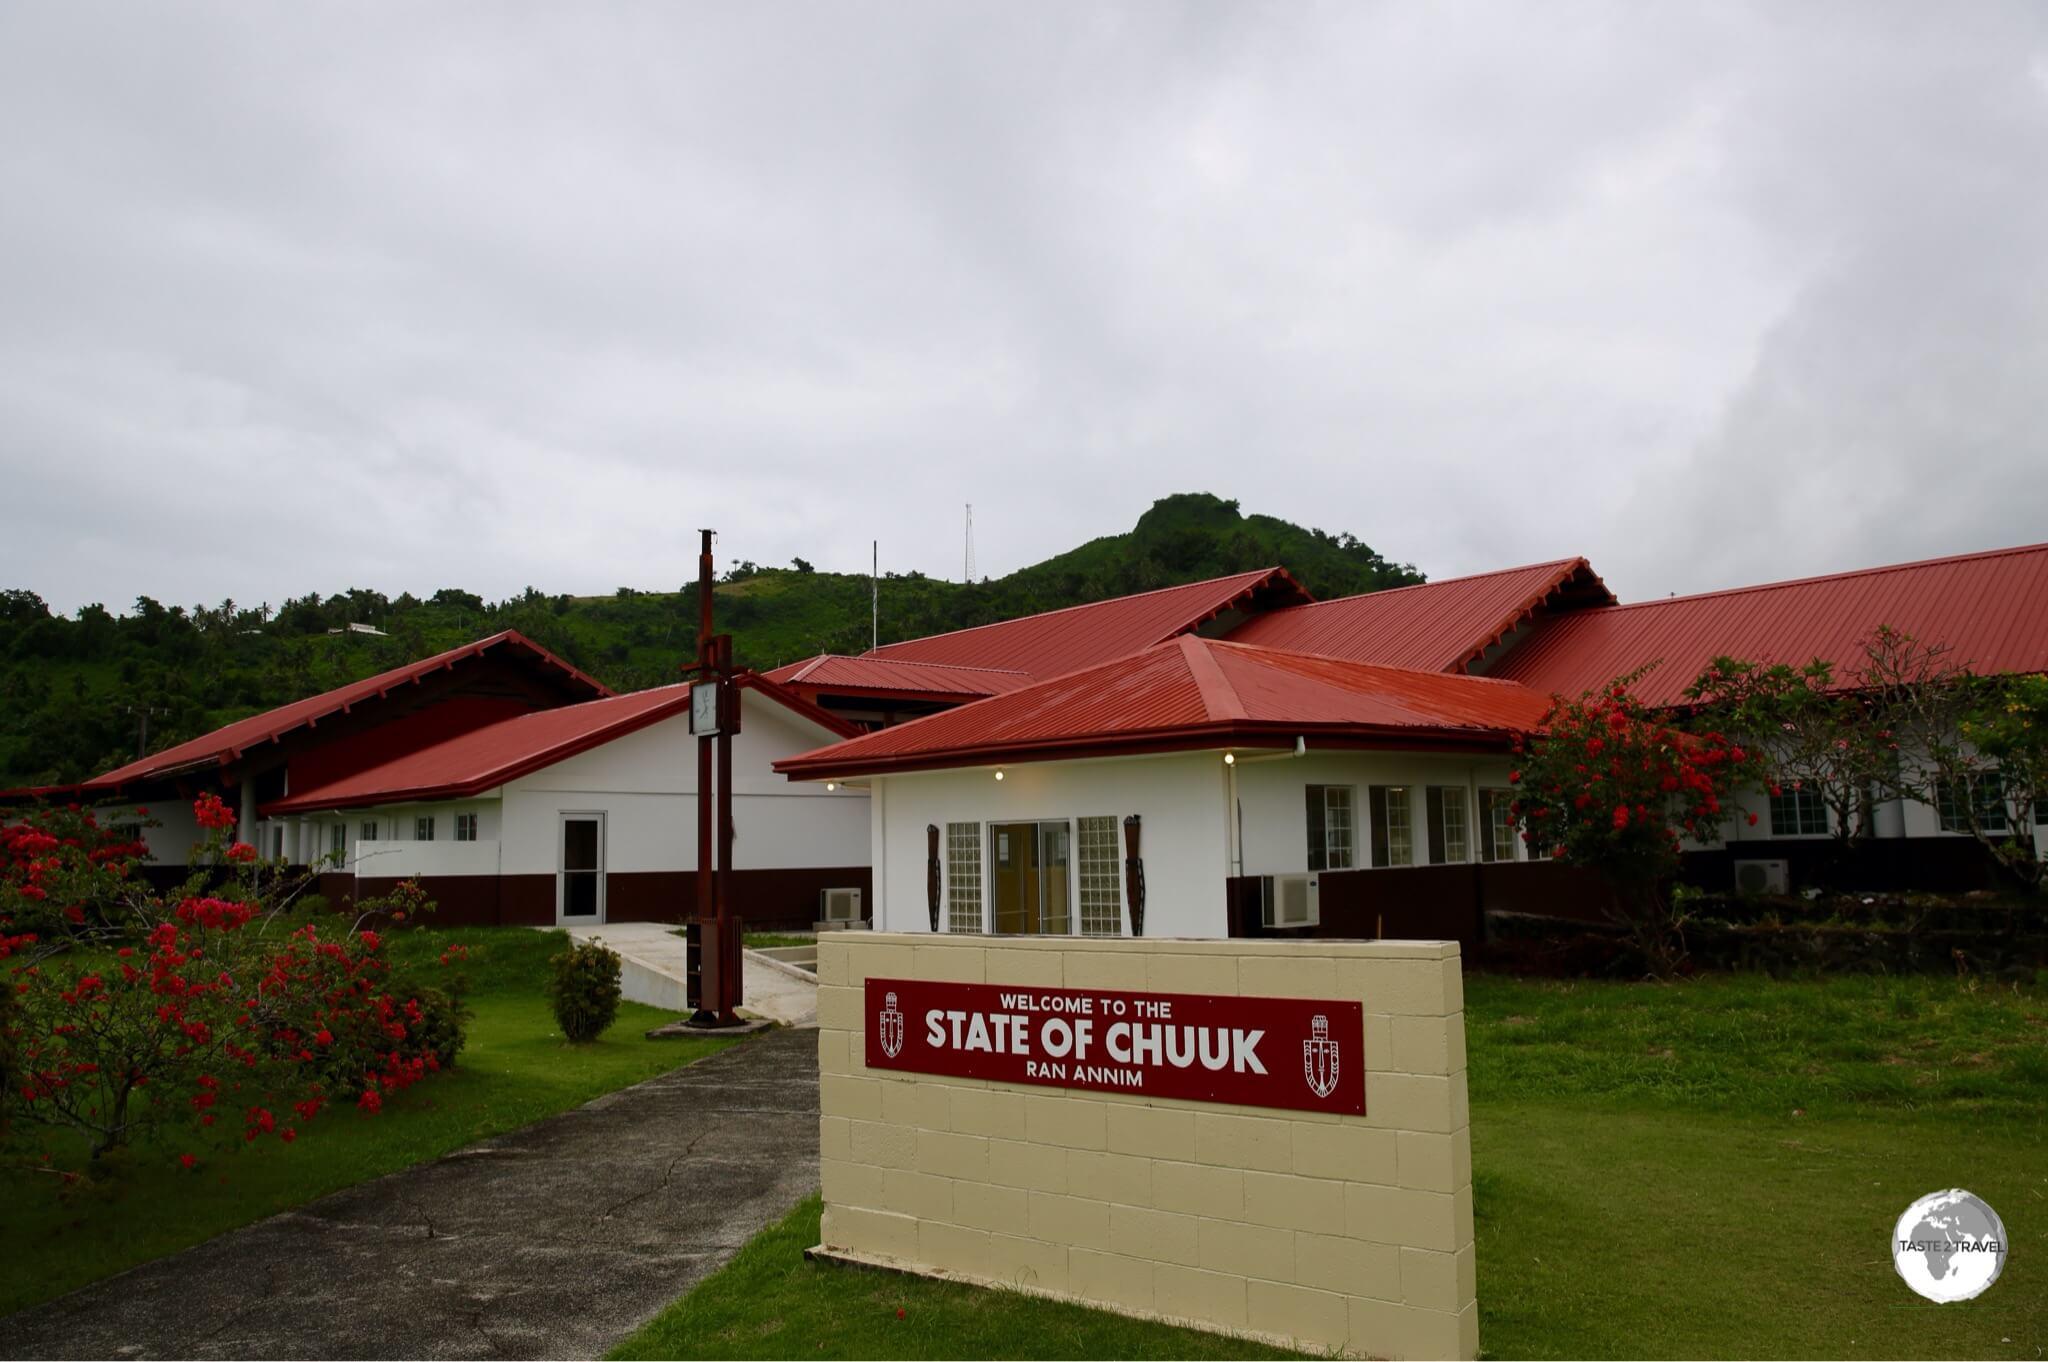 The terminal building at Chuuk International airport.